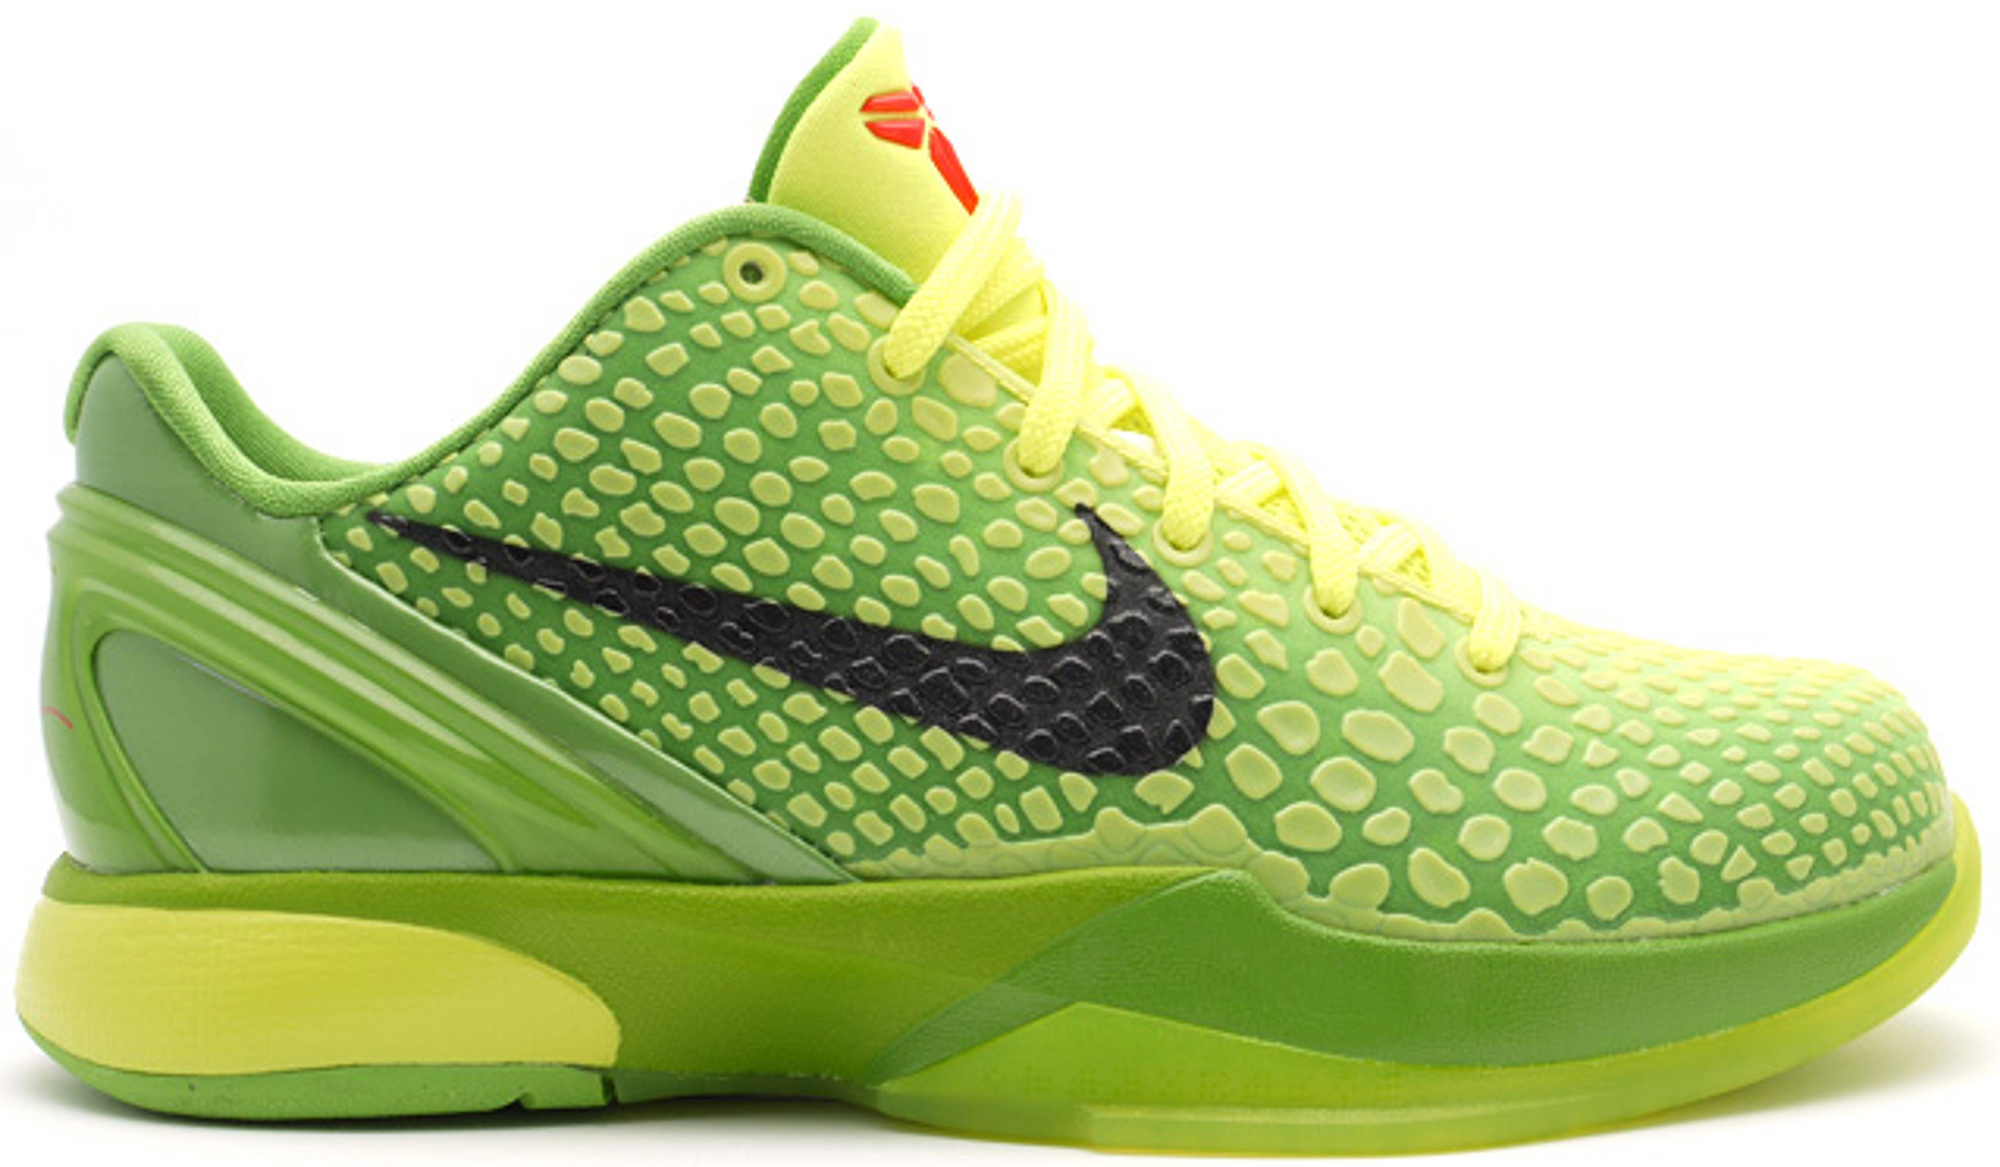 Nike Kobe 6 Grinch (GS) - 429913-300